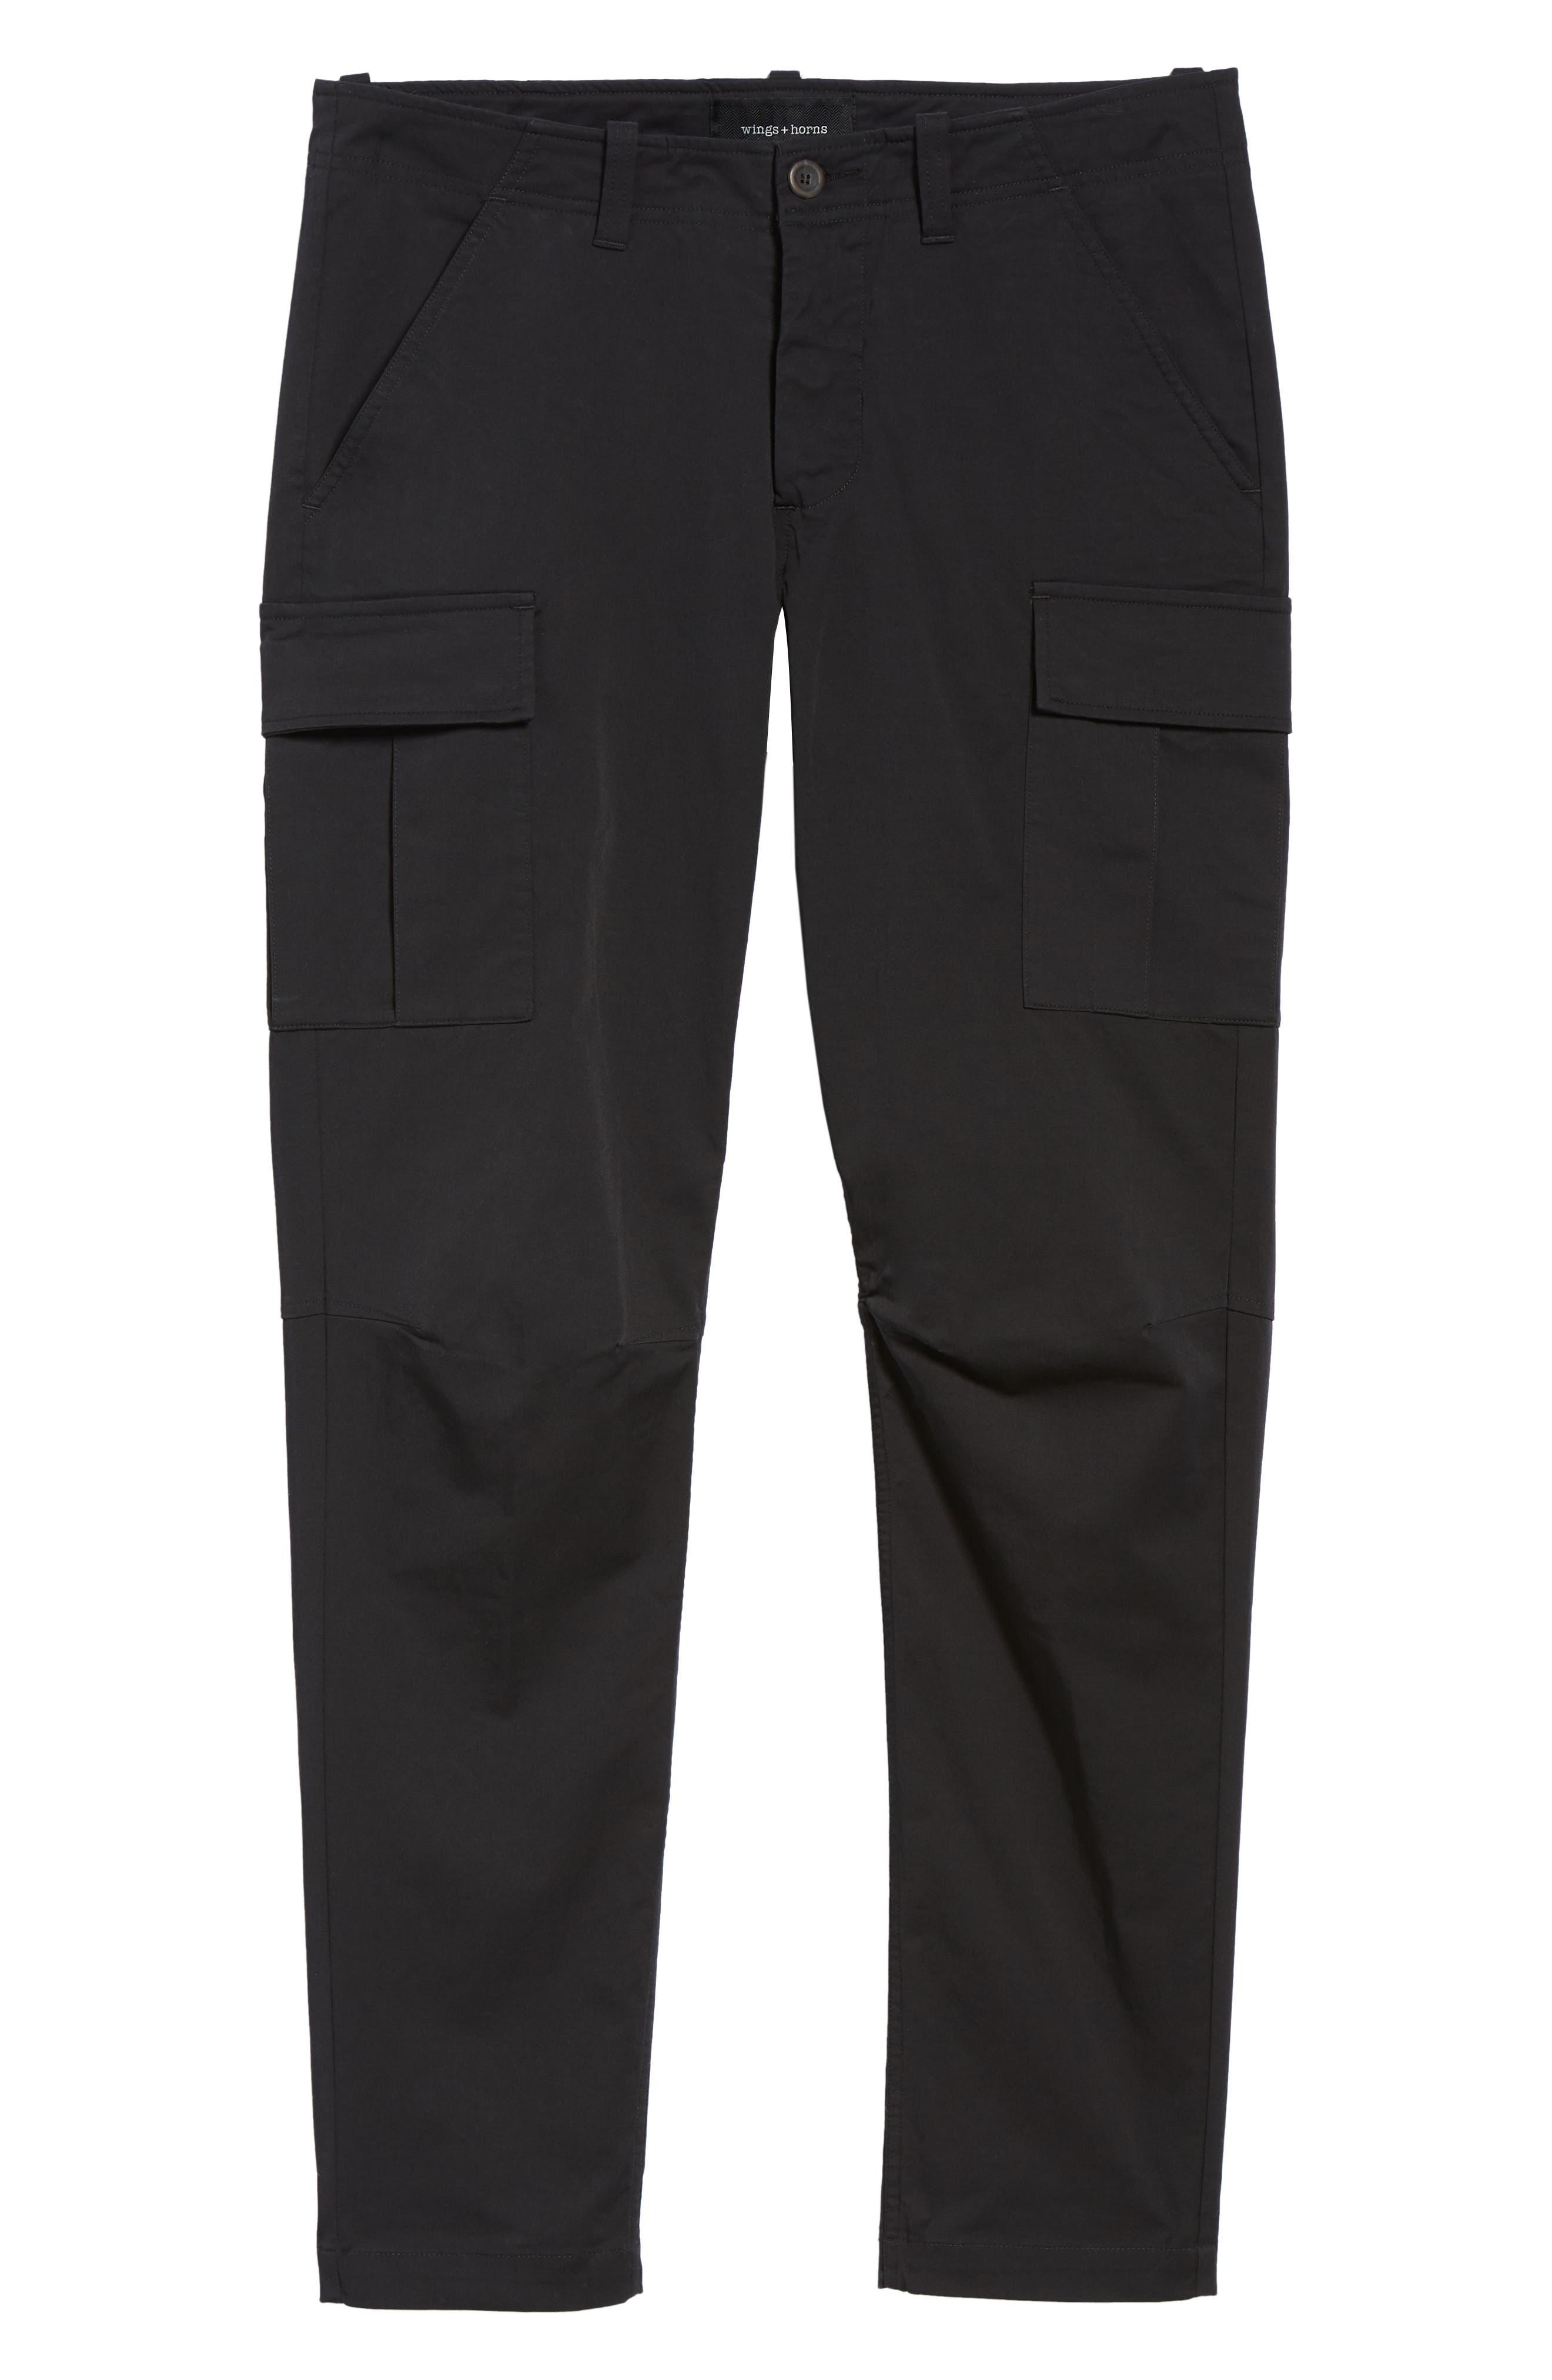 Cordura Slim Fit Cargo Pants,                             Alternate thumbnail 6, color,                             BLACK